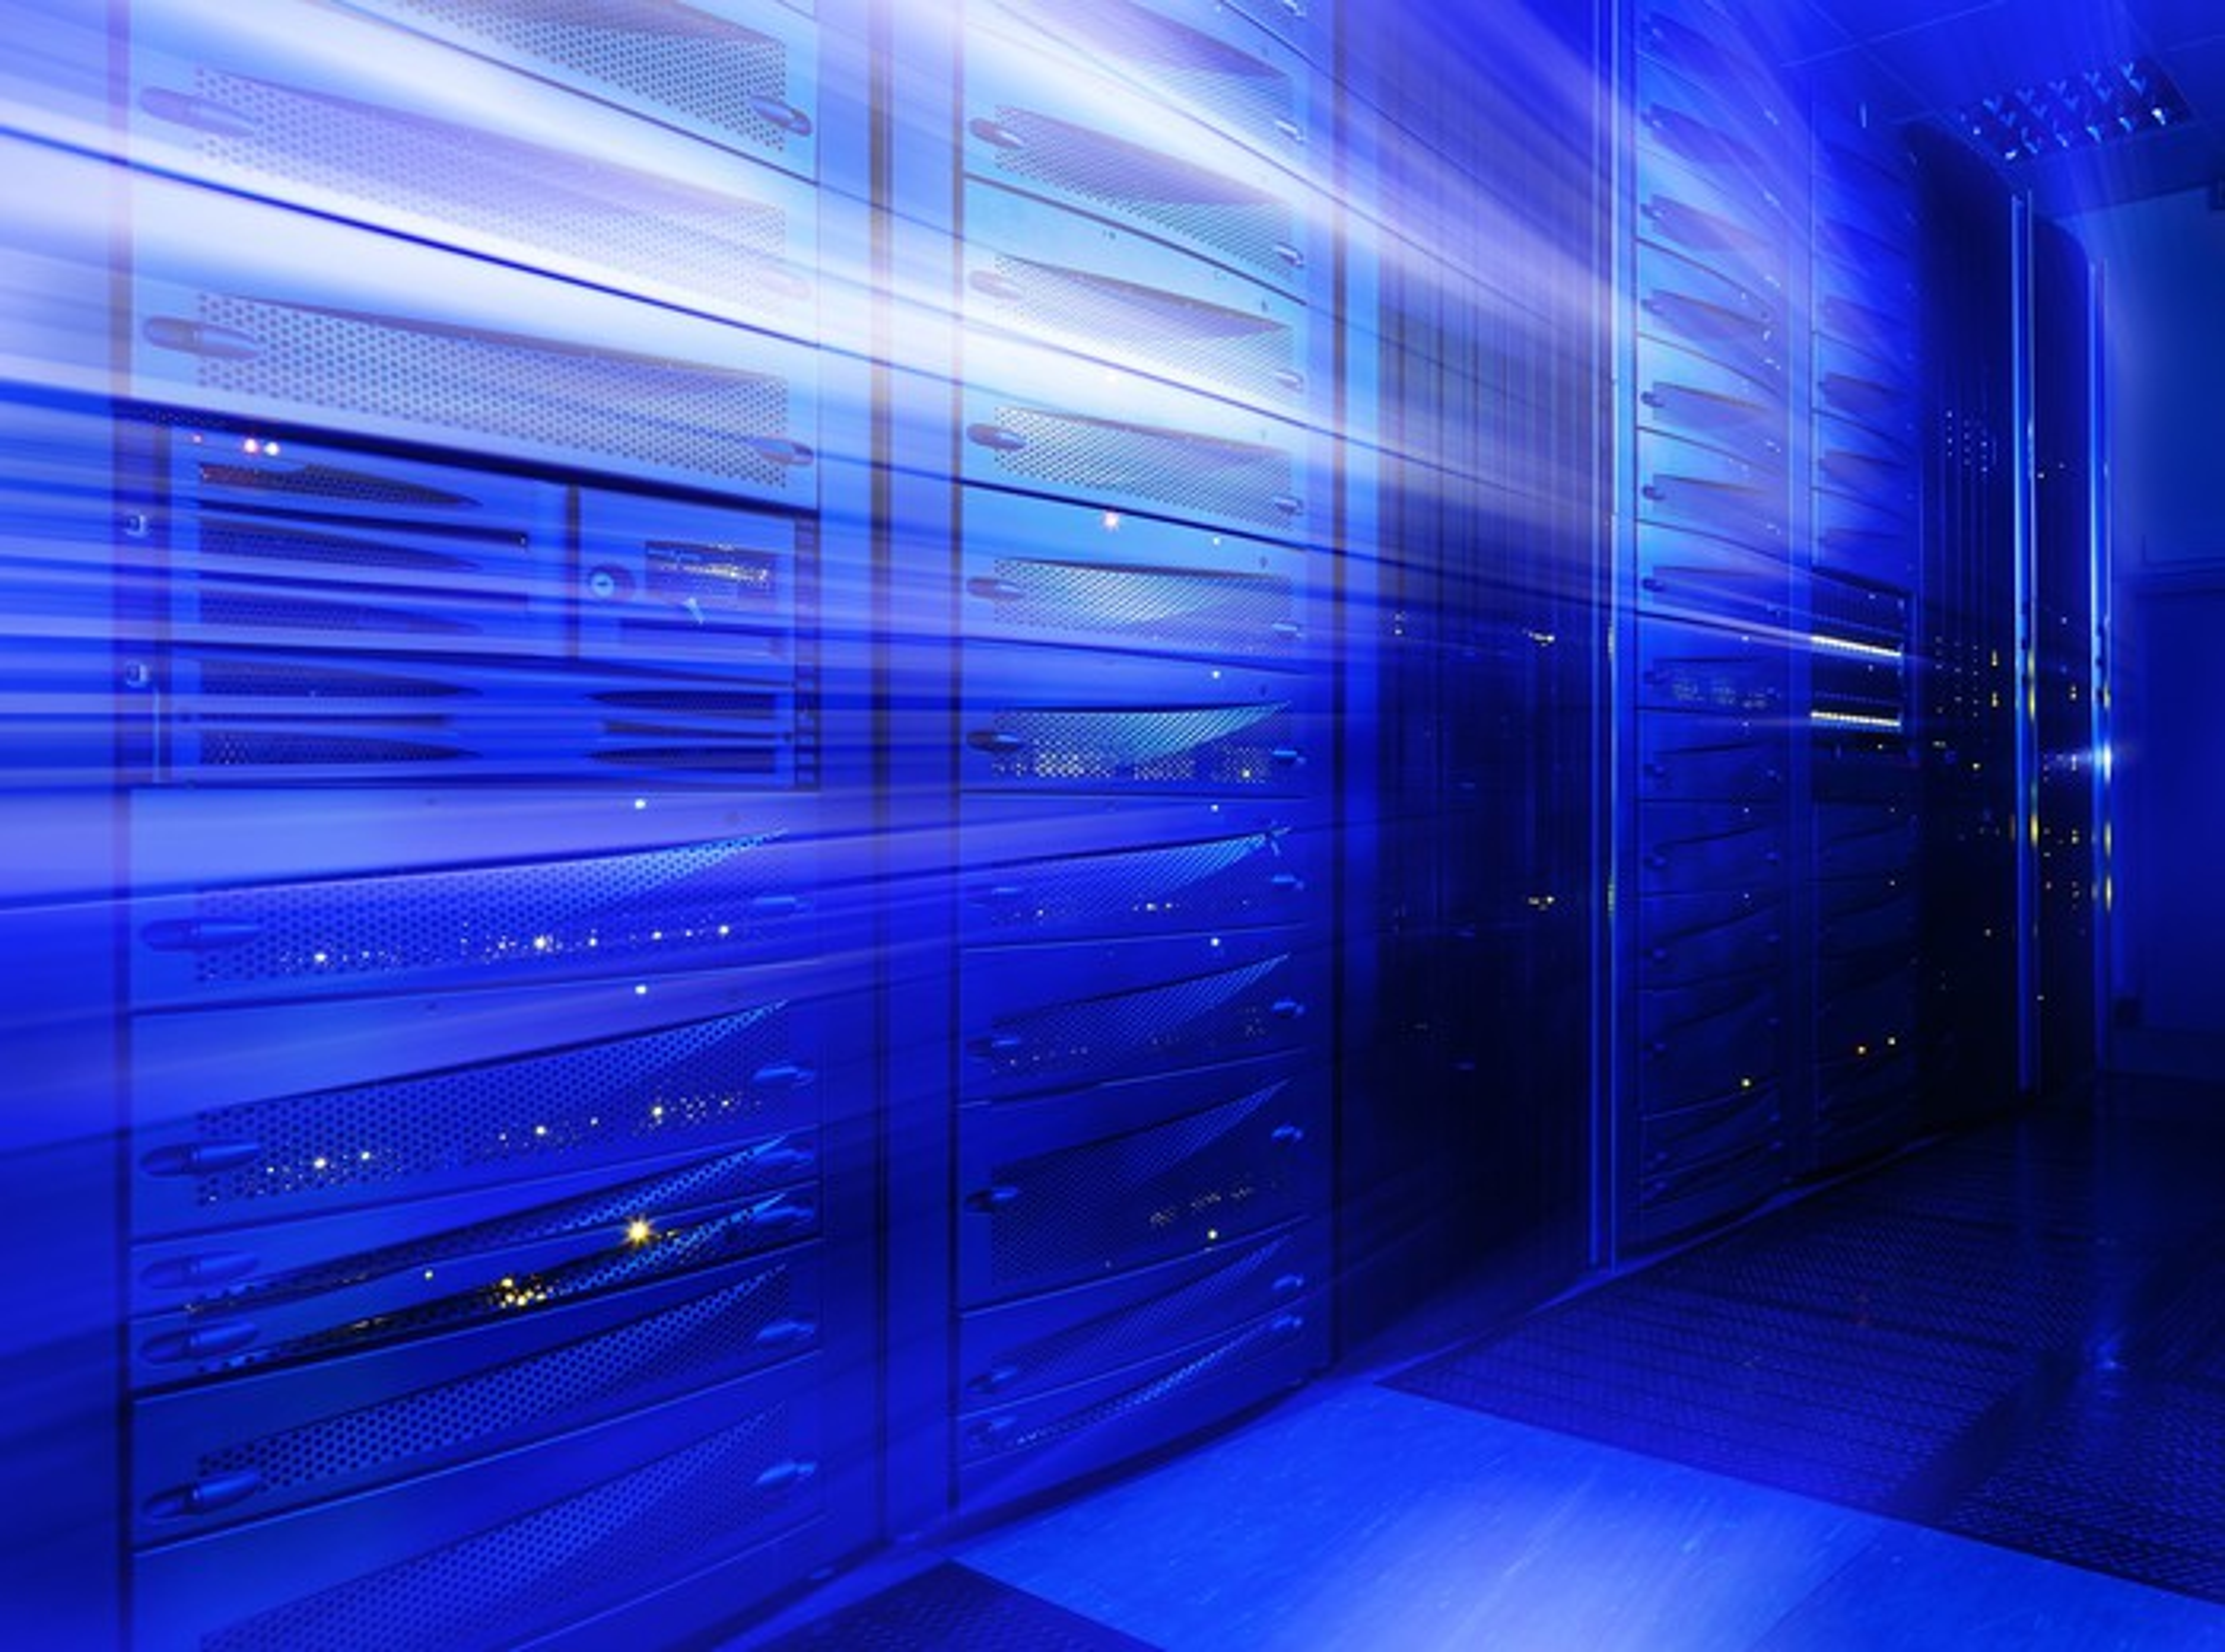 Stylized illustration of data center servers